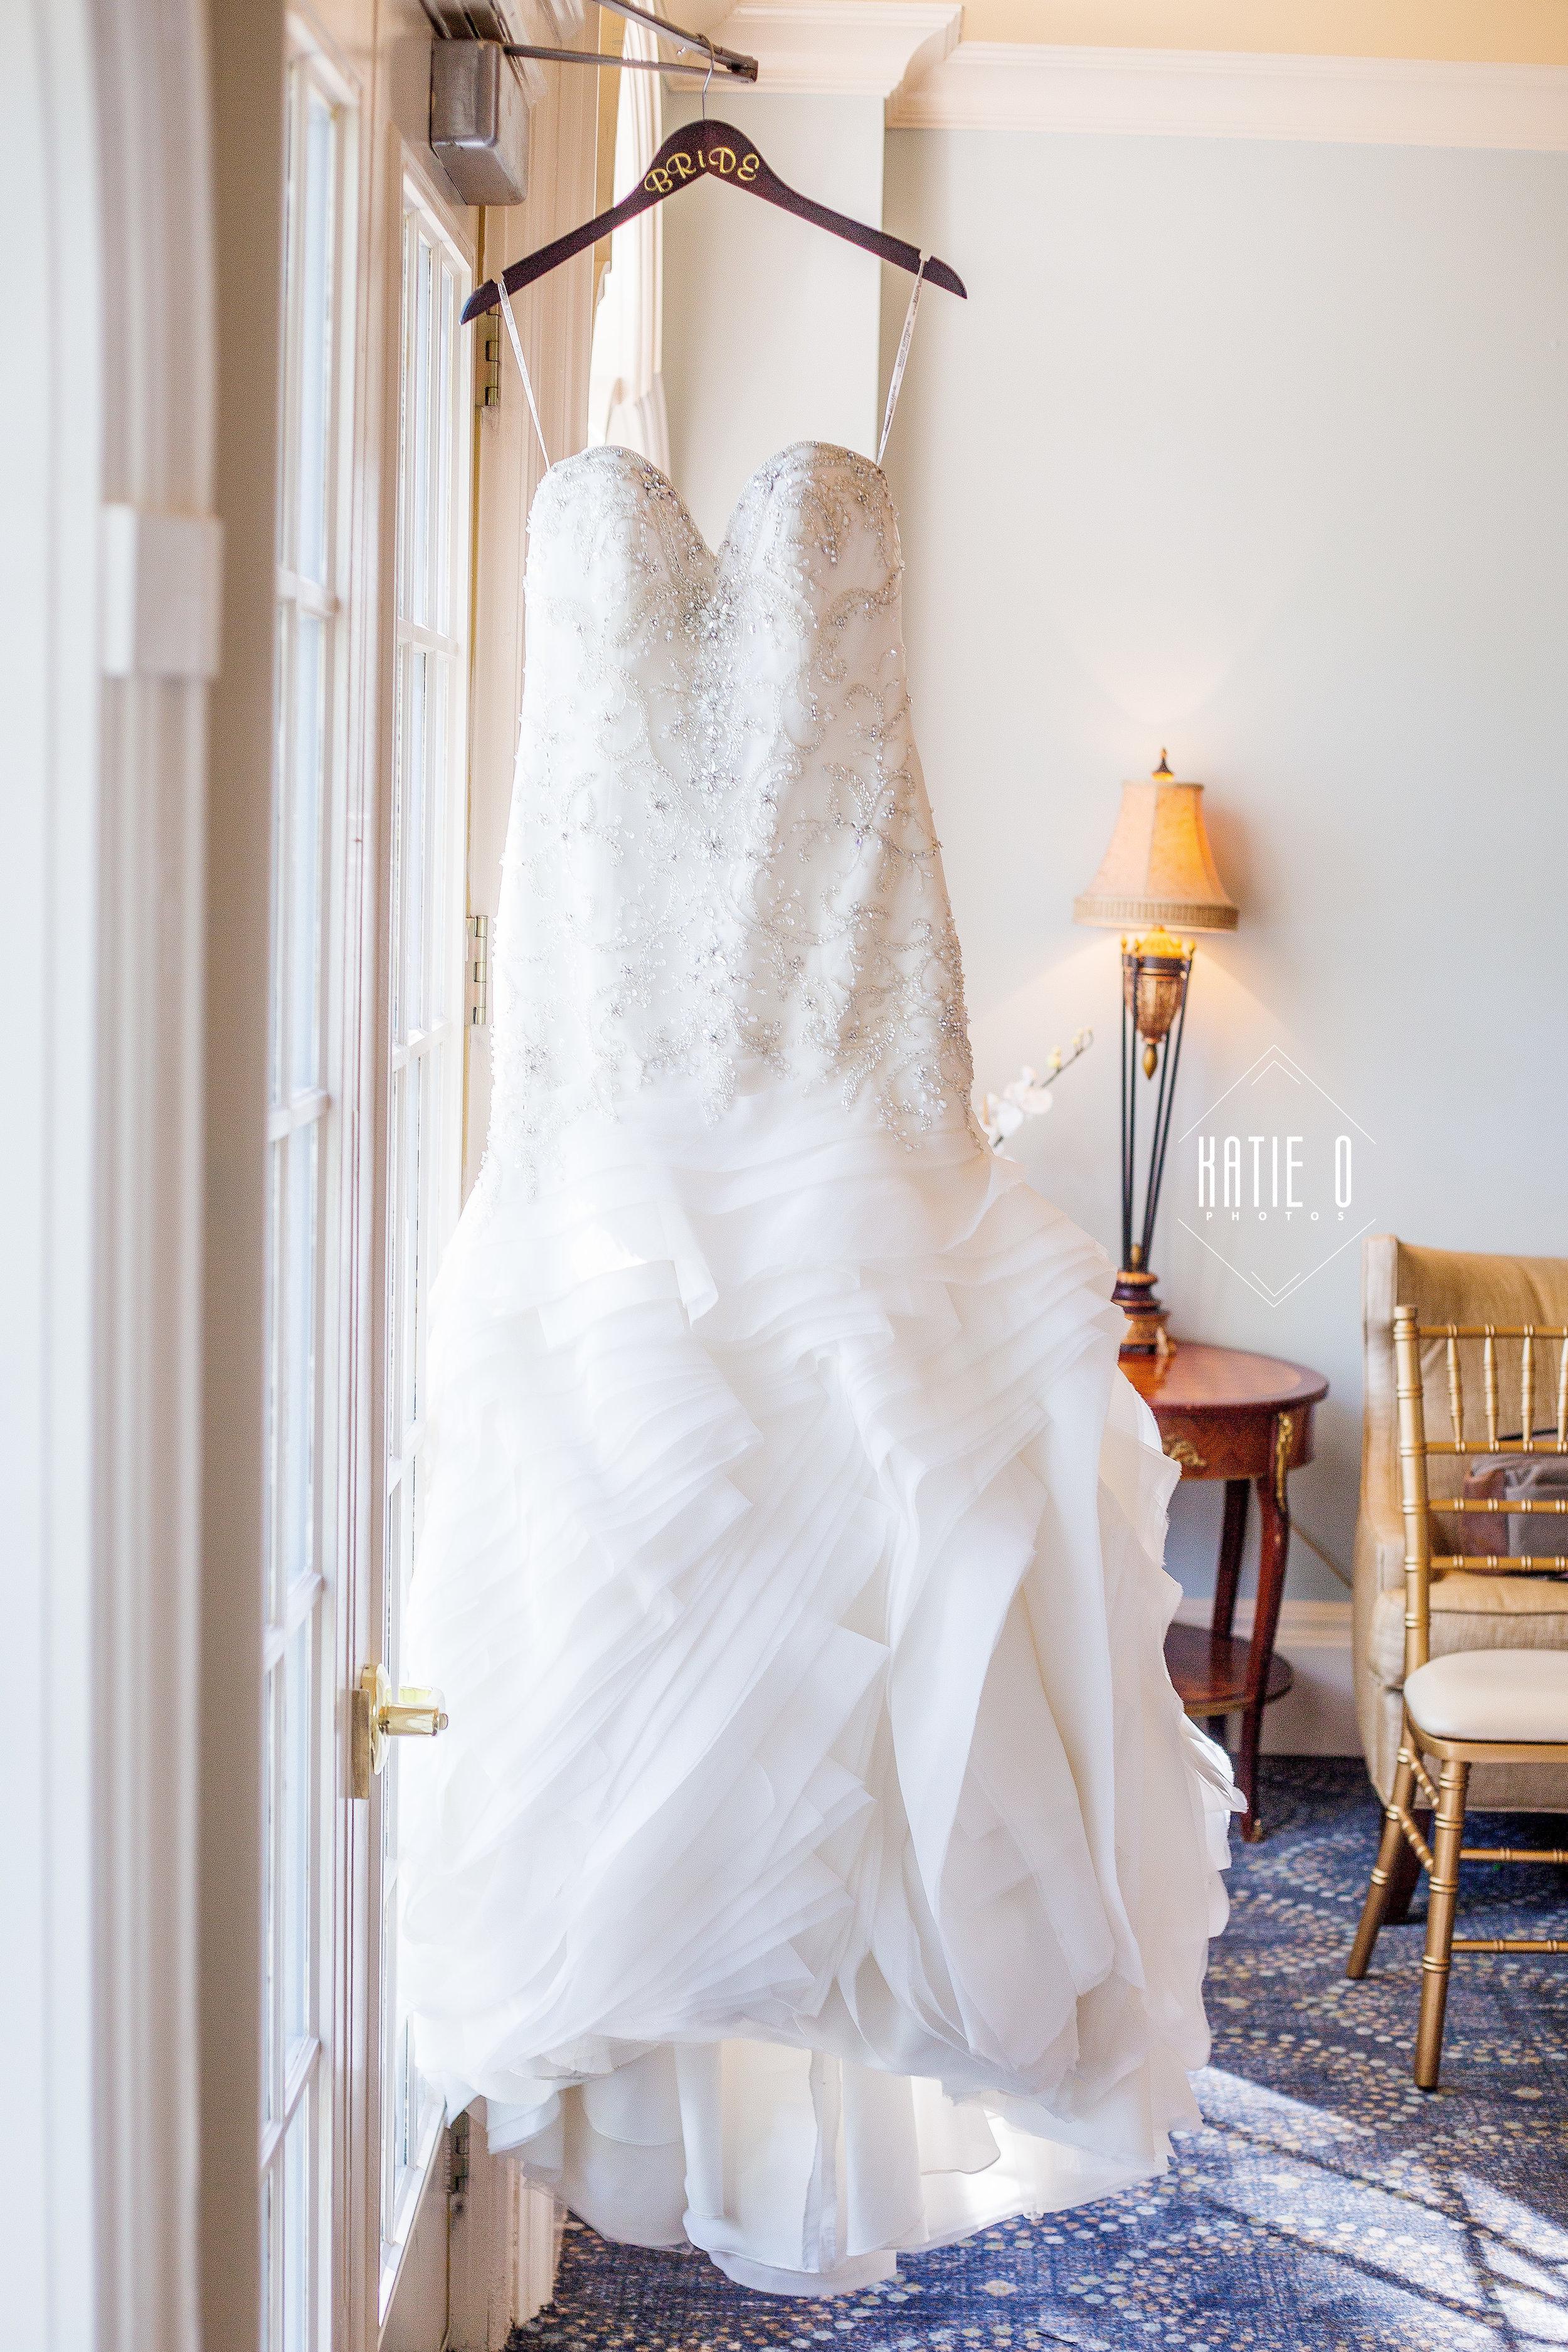 CT-WEDDING-PHOTOGRAPHER-BLOG-1.jpg